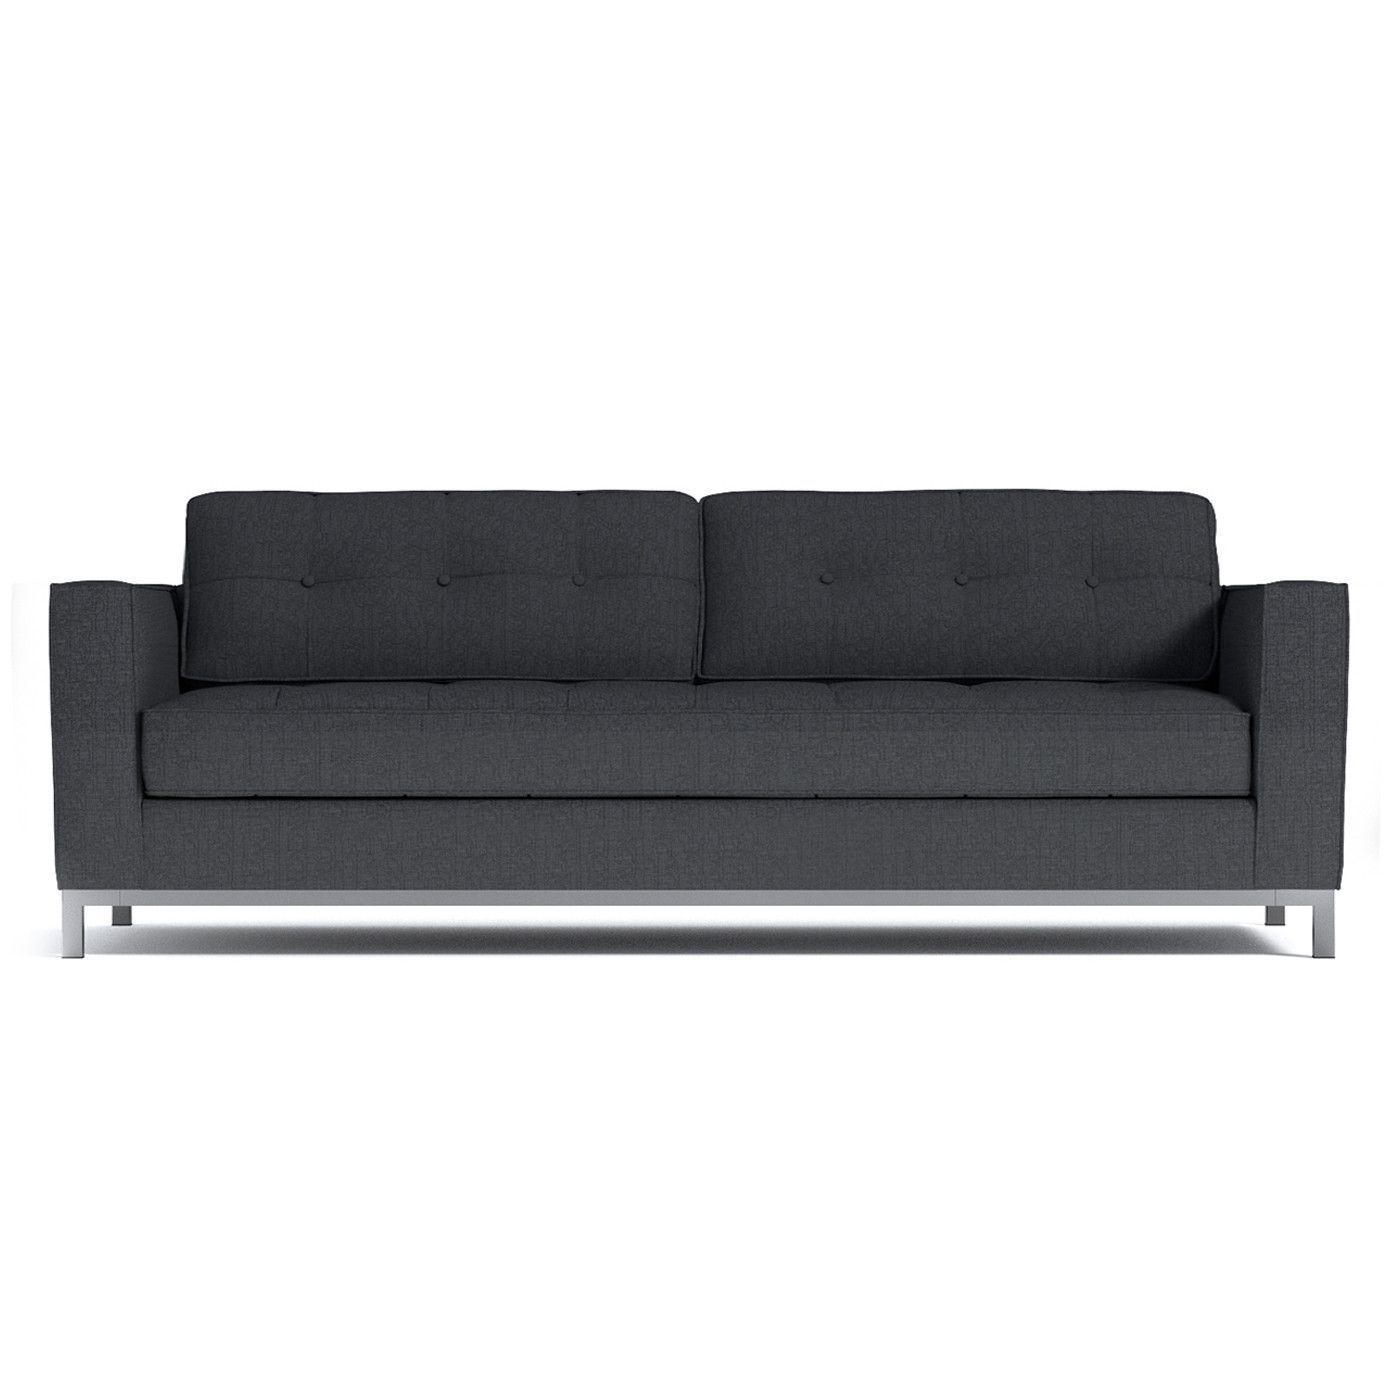 Fillmore Sofa Queen Size Sleeper Sofa Sleeper Sofa Sofa